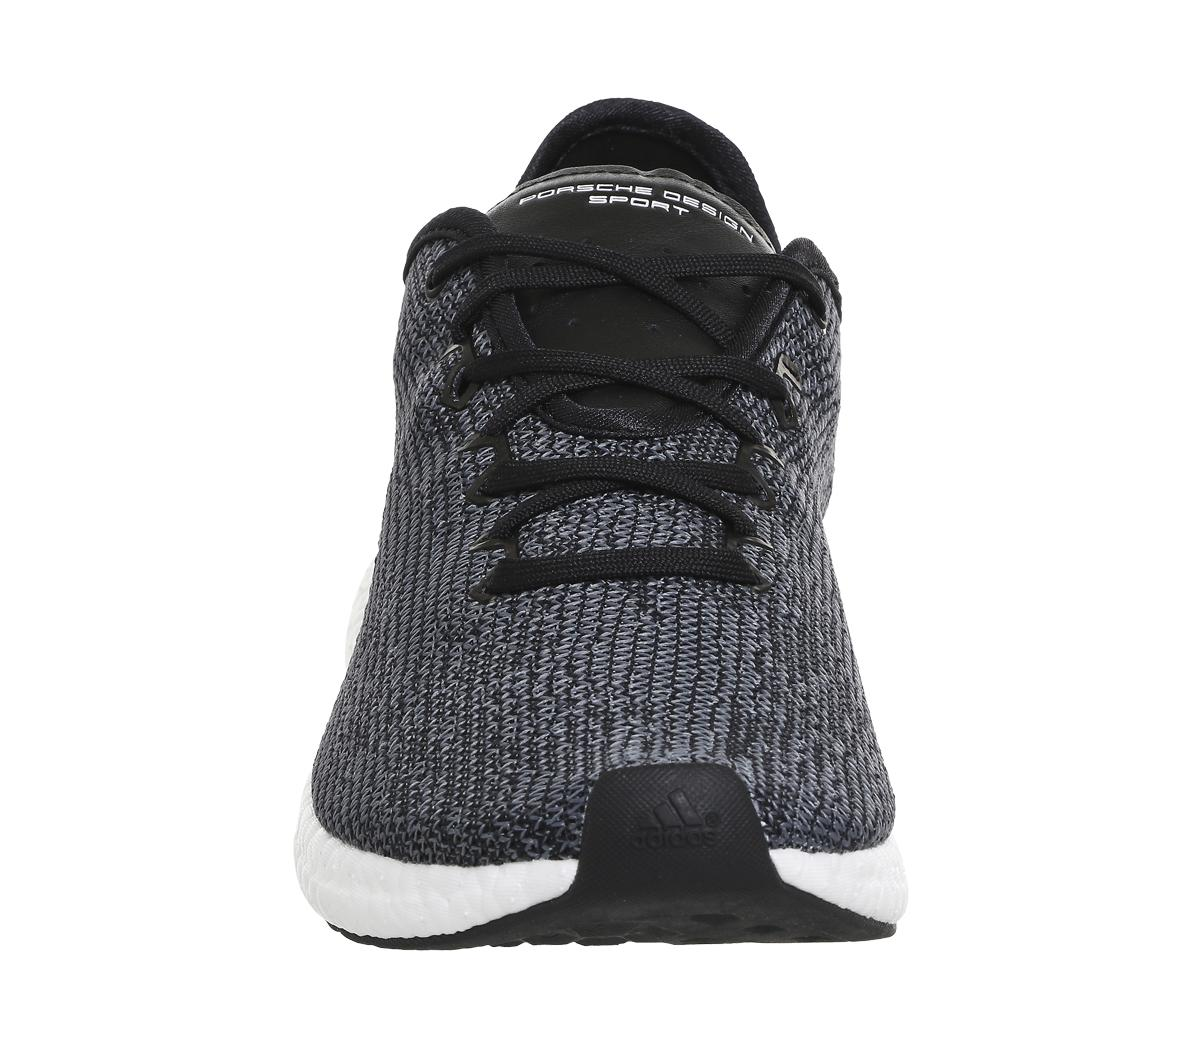 adidas Originals Travel Tourer in Black for Men